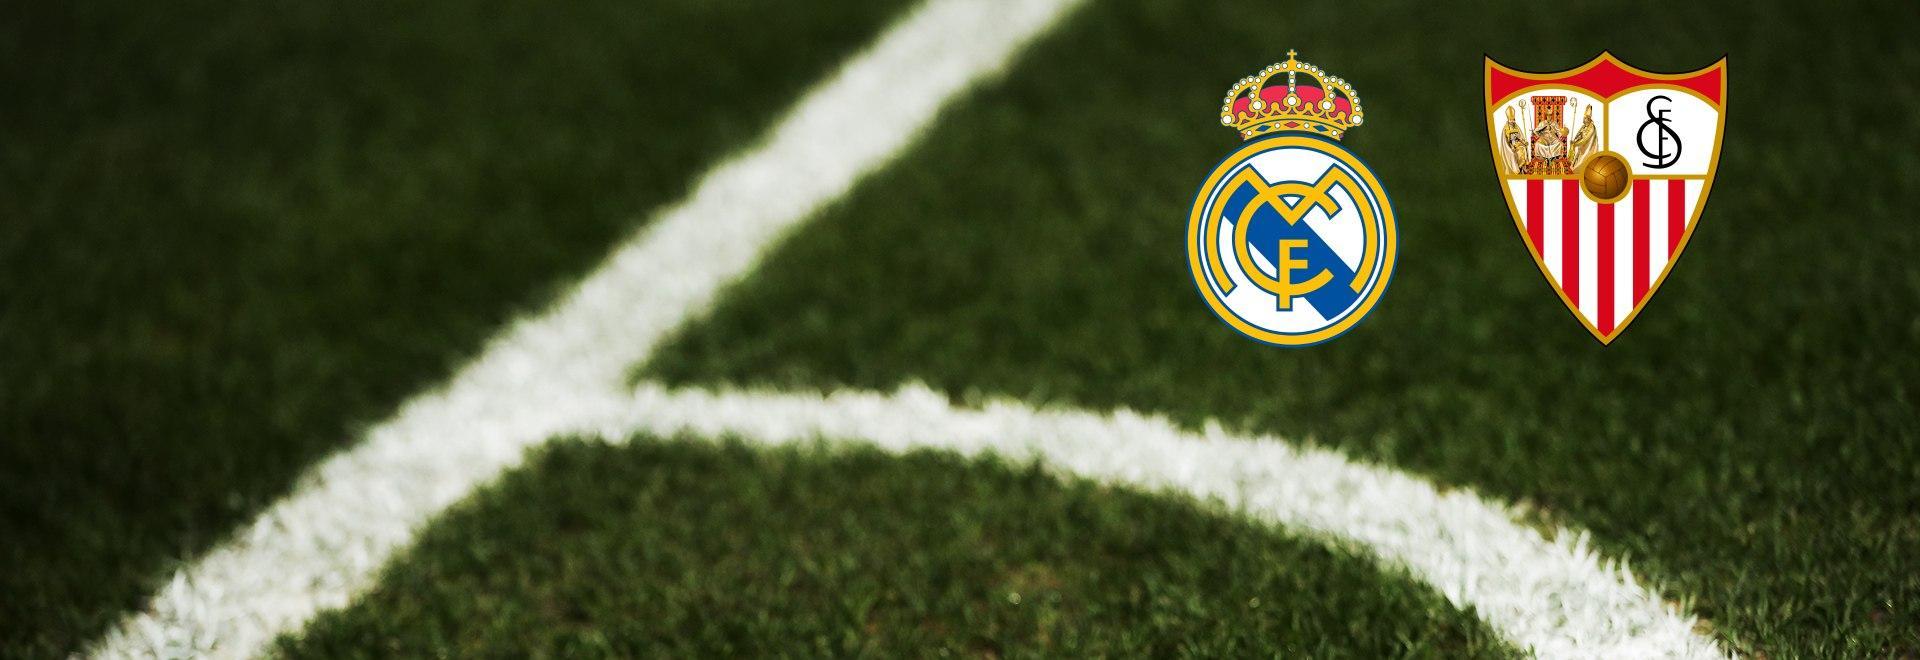 Real Madrid - Siviglia. 20a g.